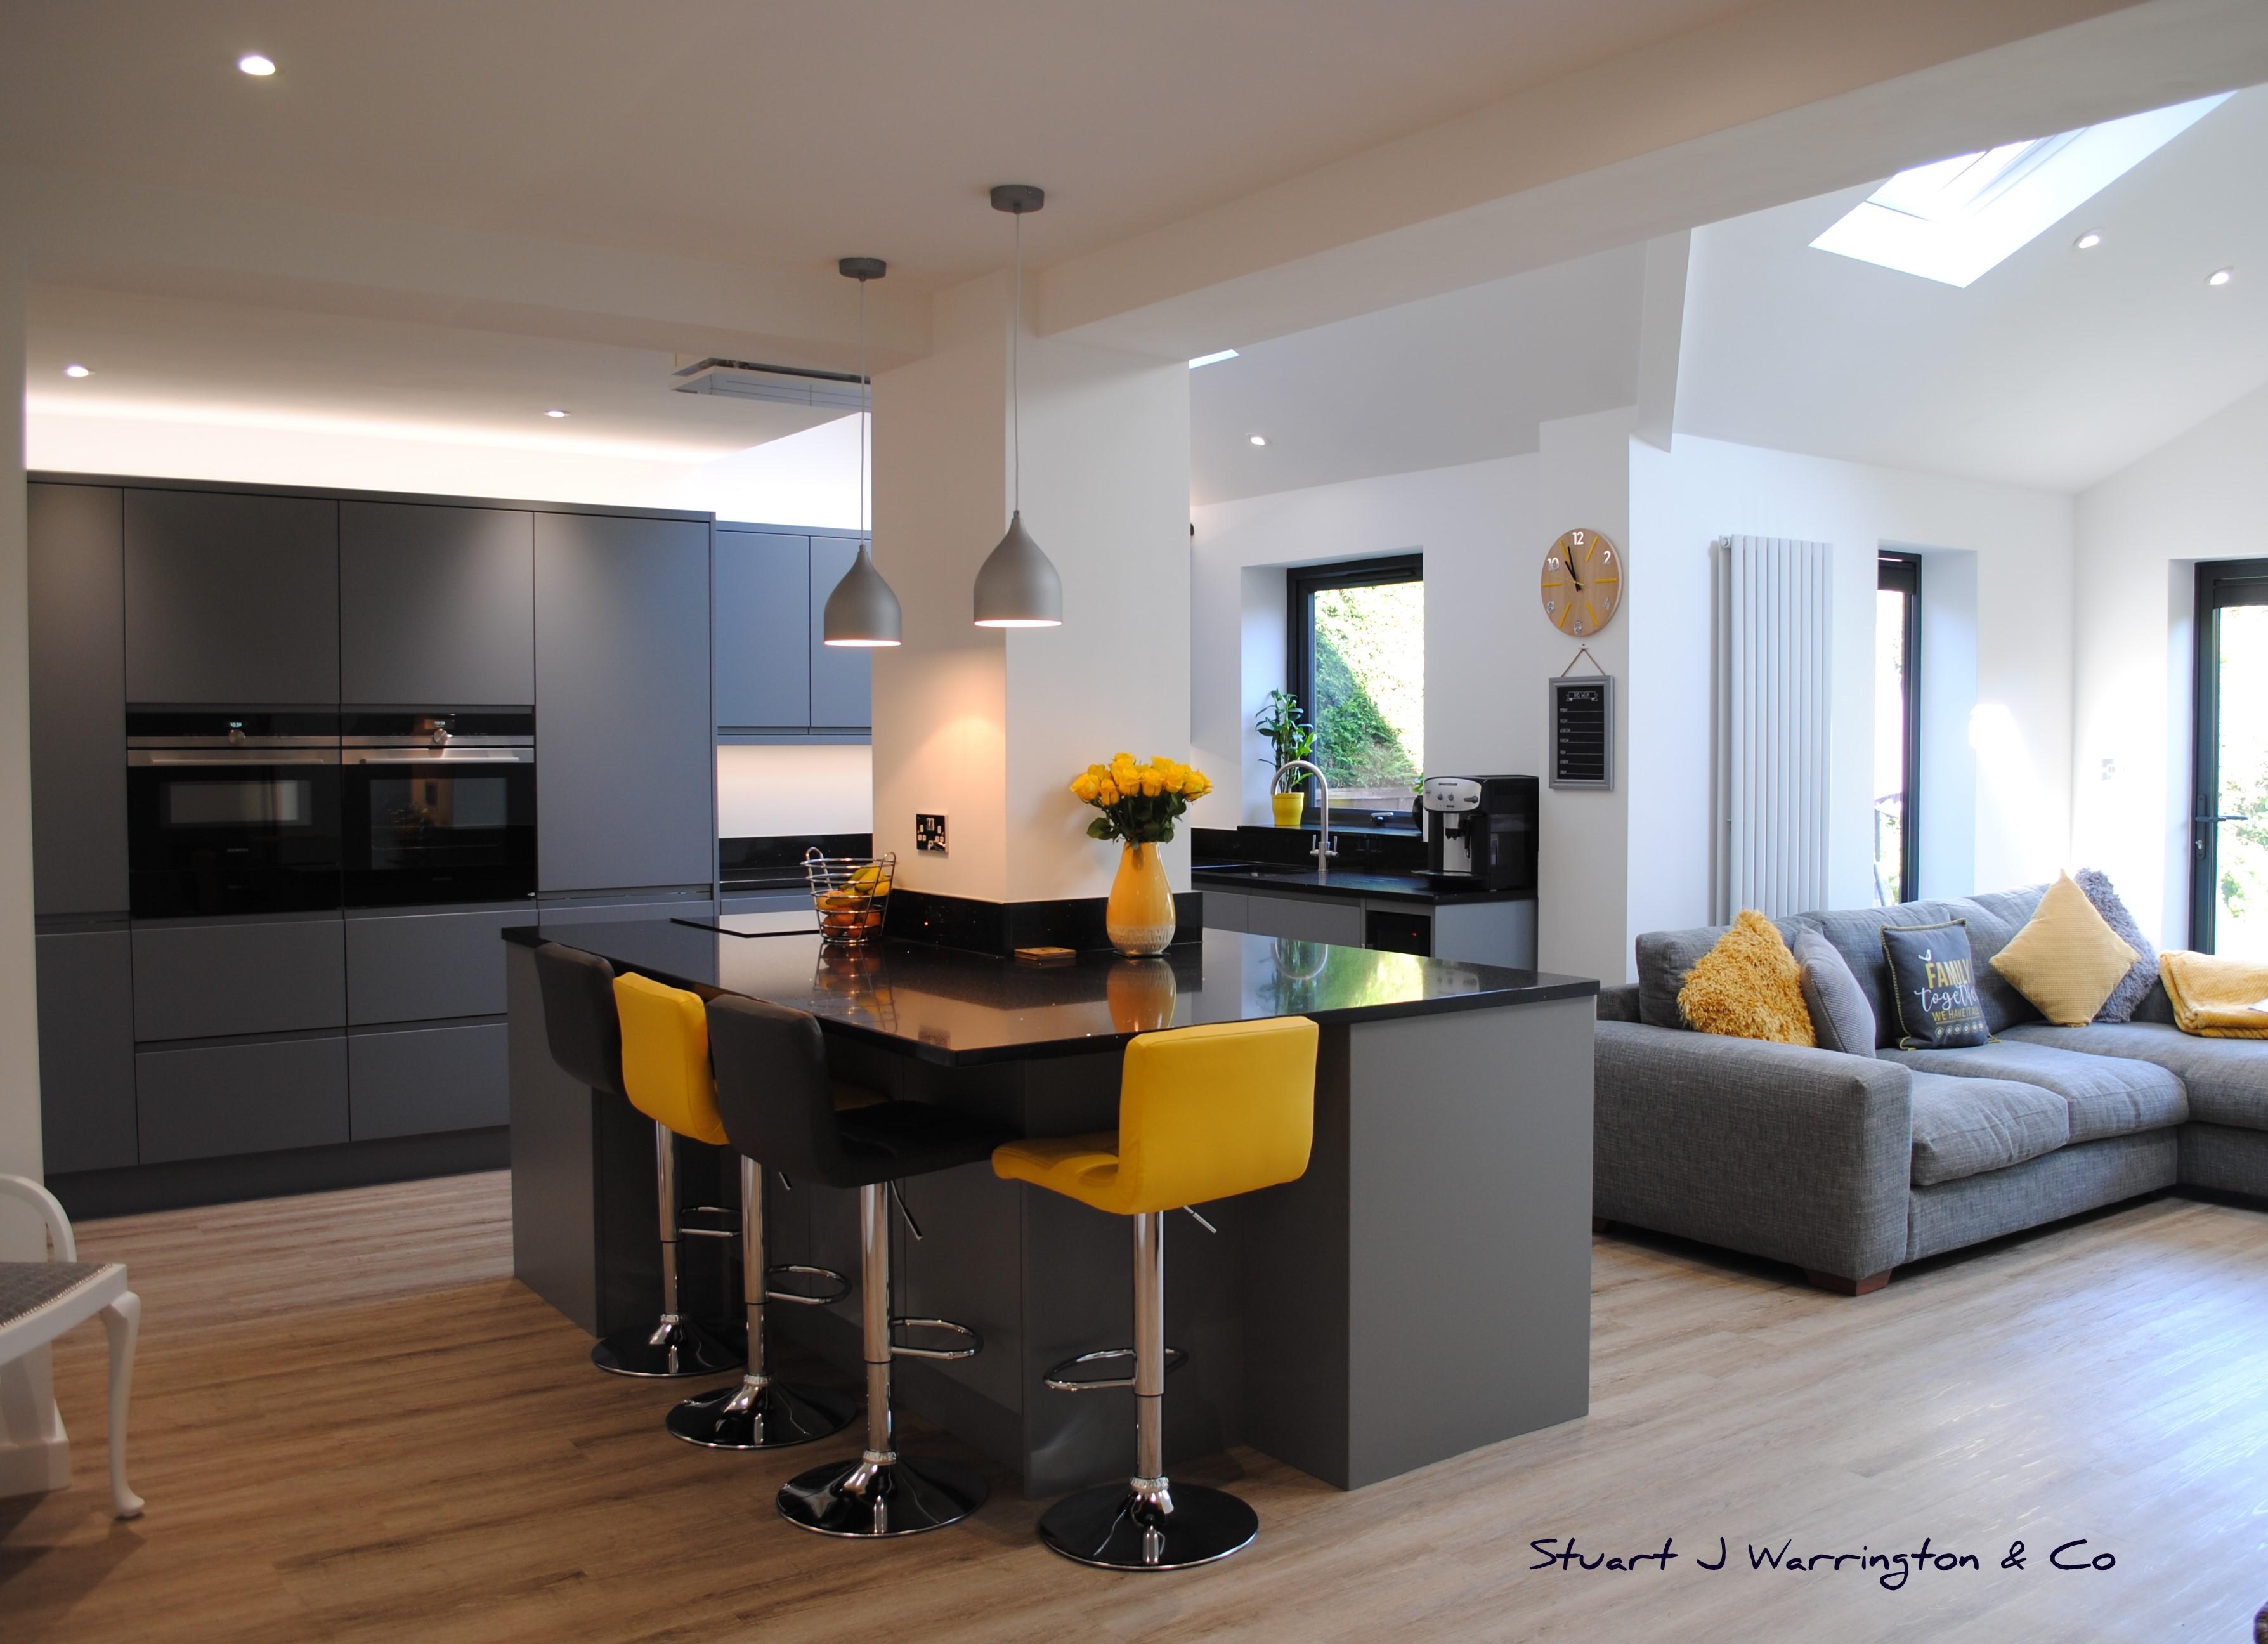 Stuart J Warrington Kitchens Macclesfield Kitchen Gallery